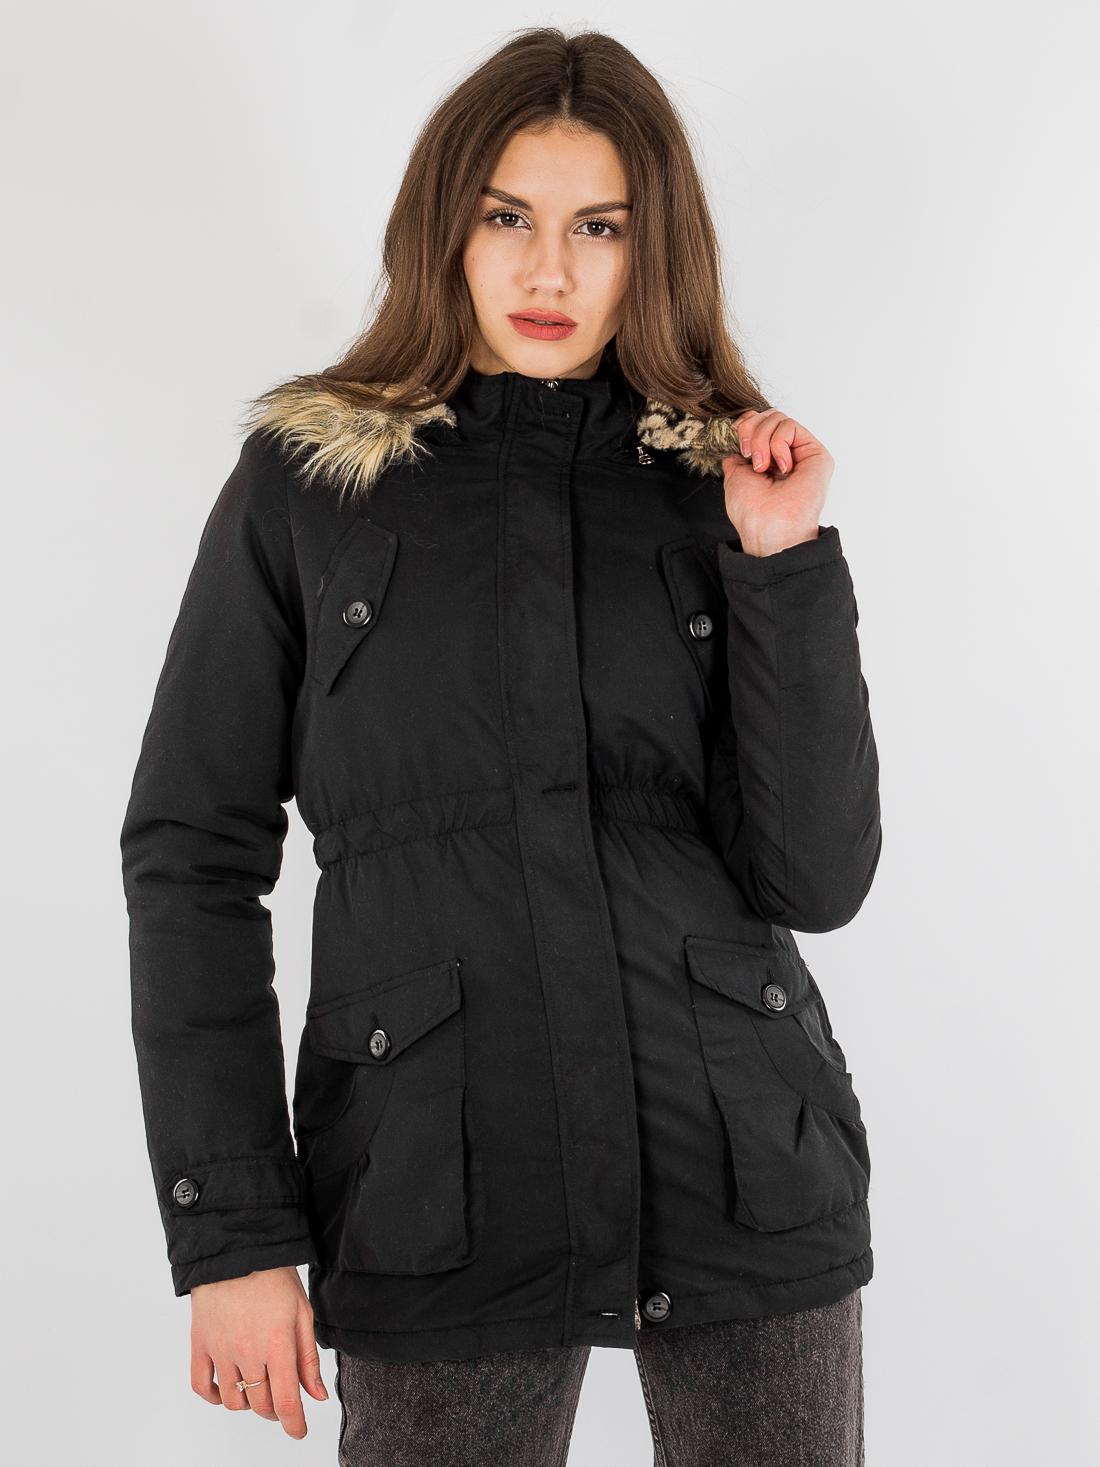 Куртка Brave Soul  Черный Free Style